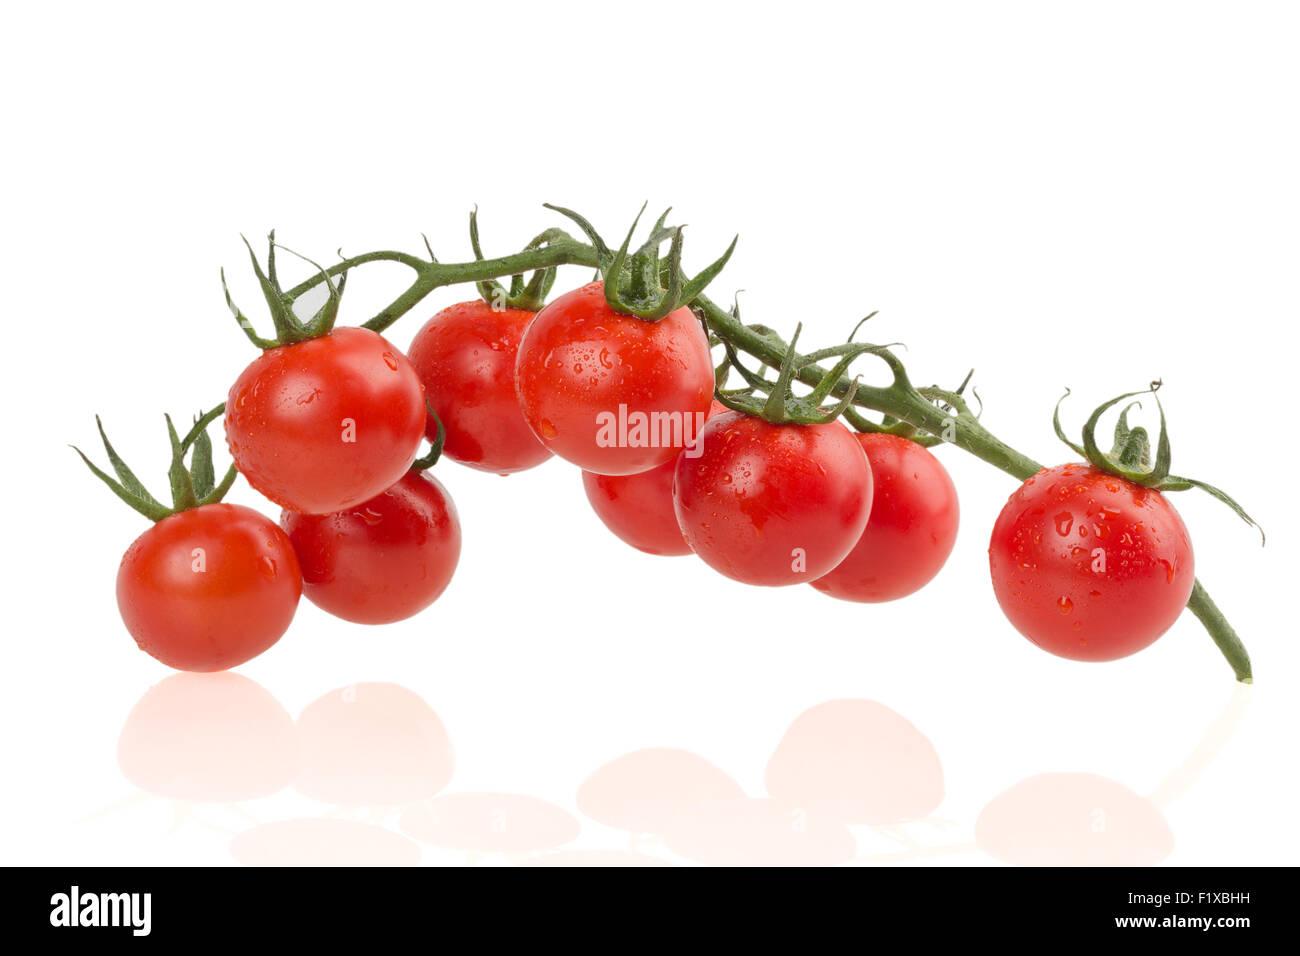 Ripe tomatoes on white background. - Stock Image